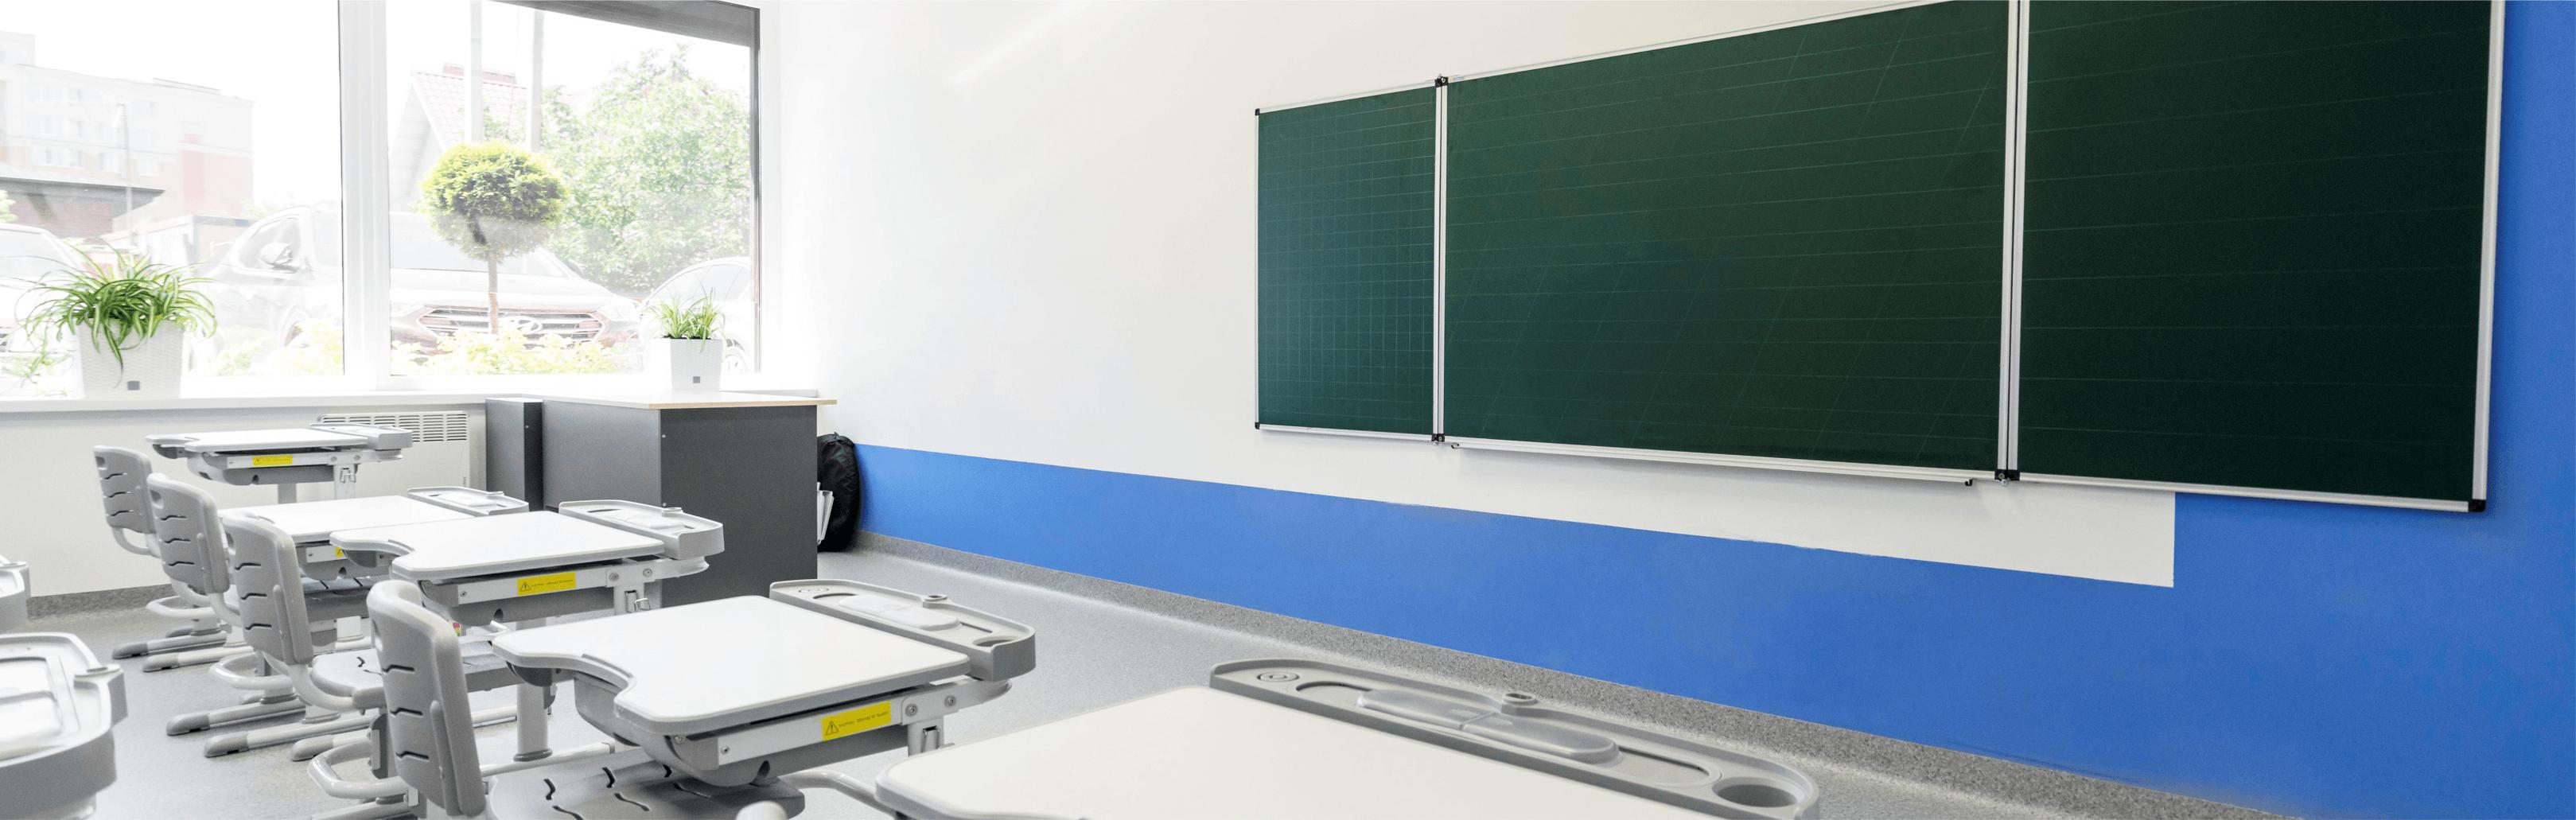 NexusTruck Academy Mokymo įstaigos